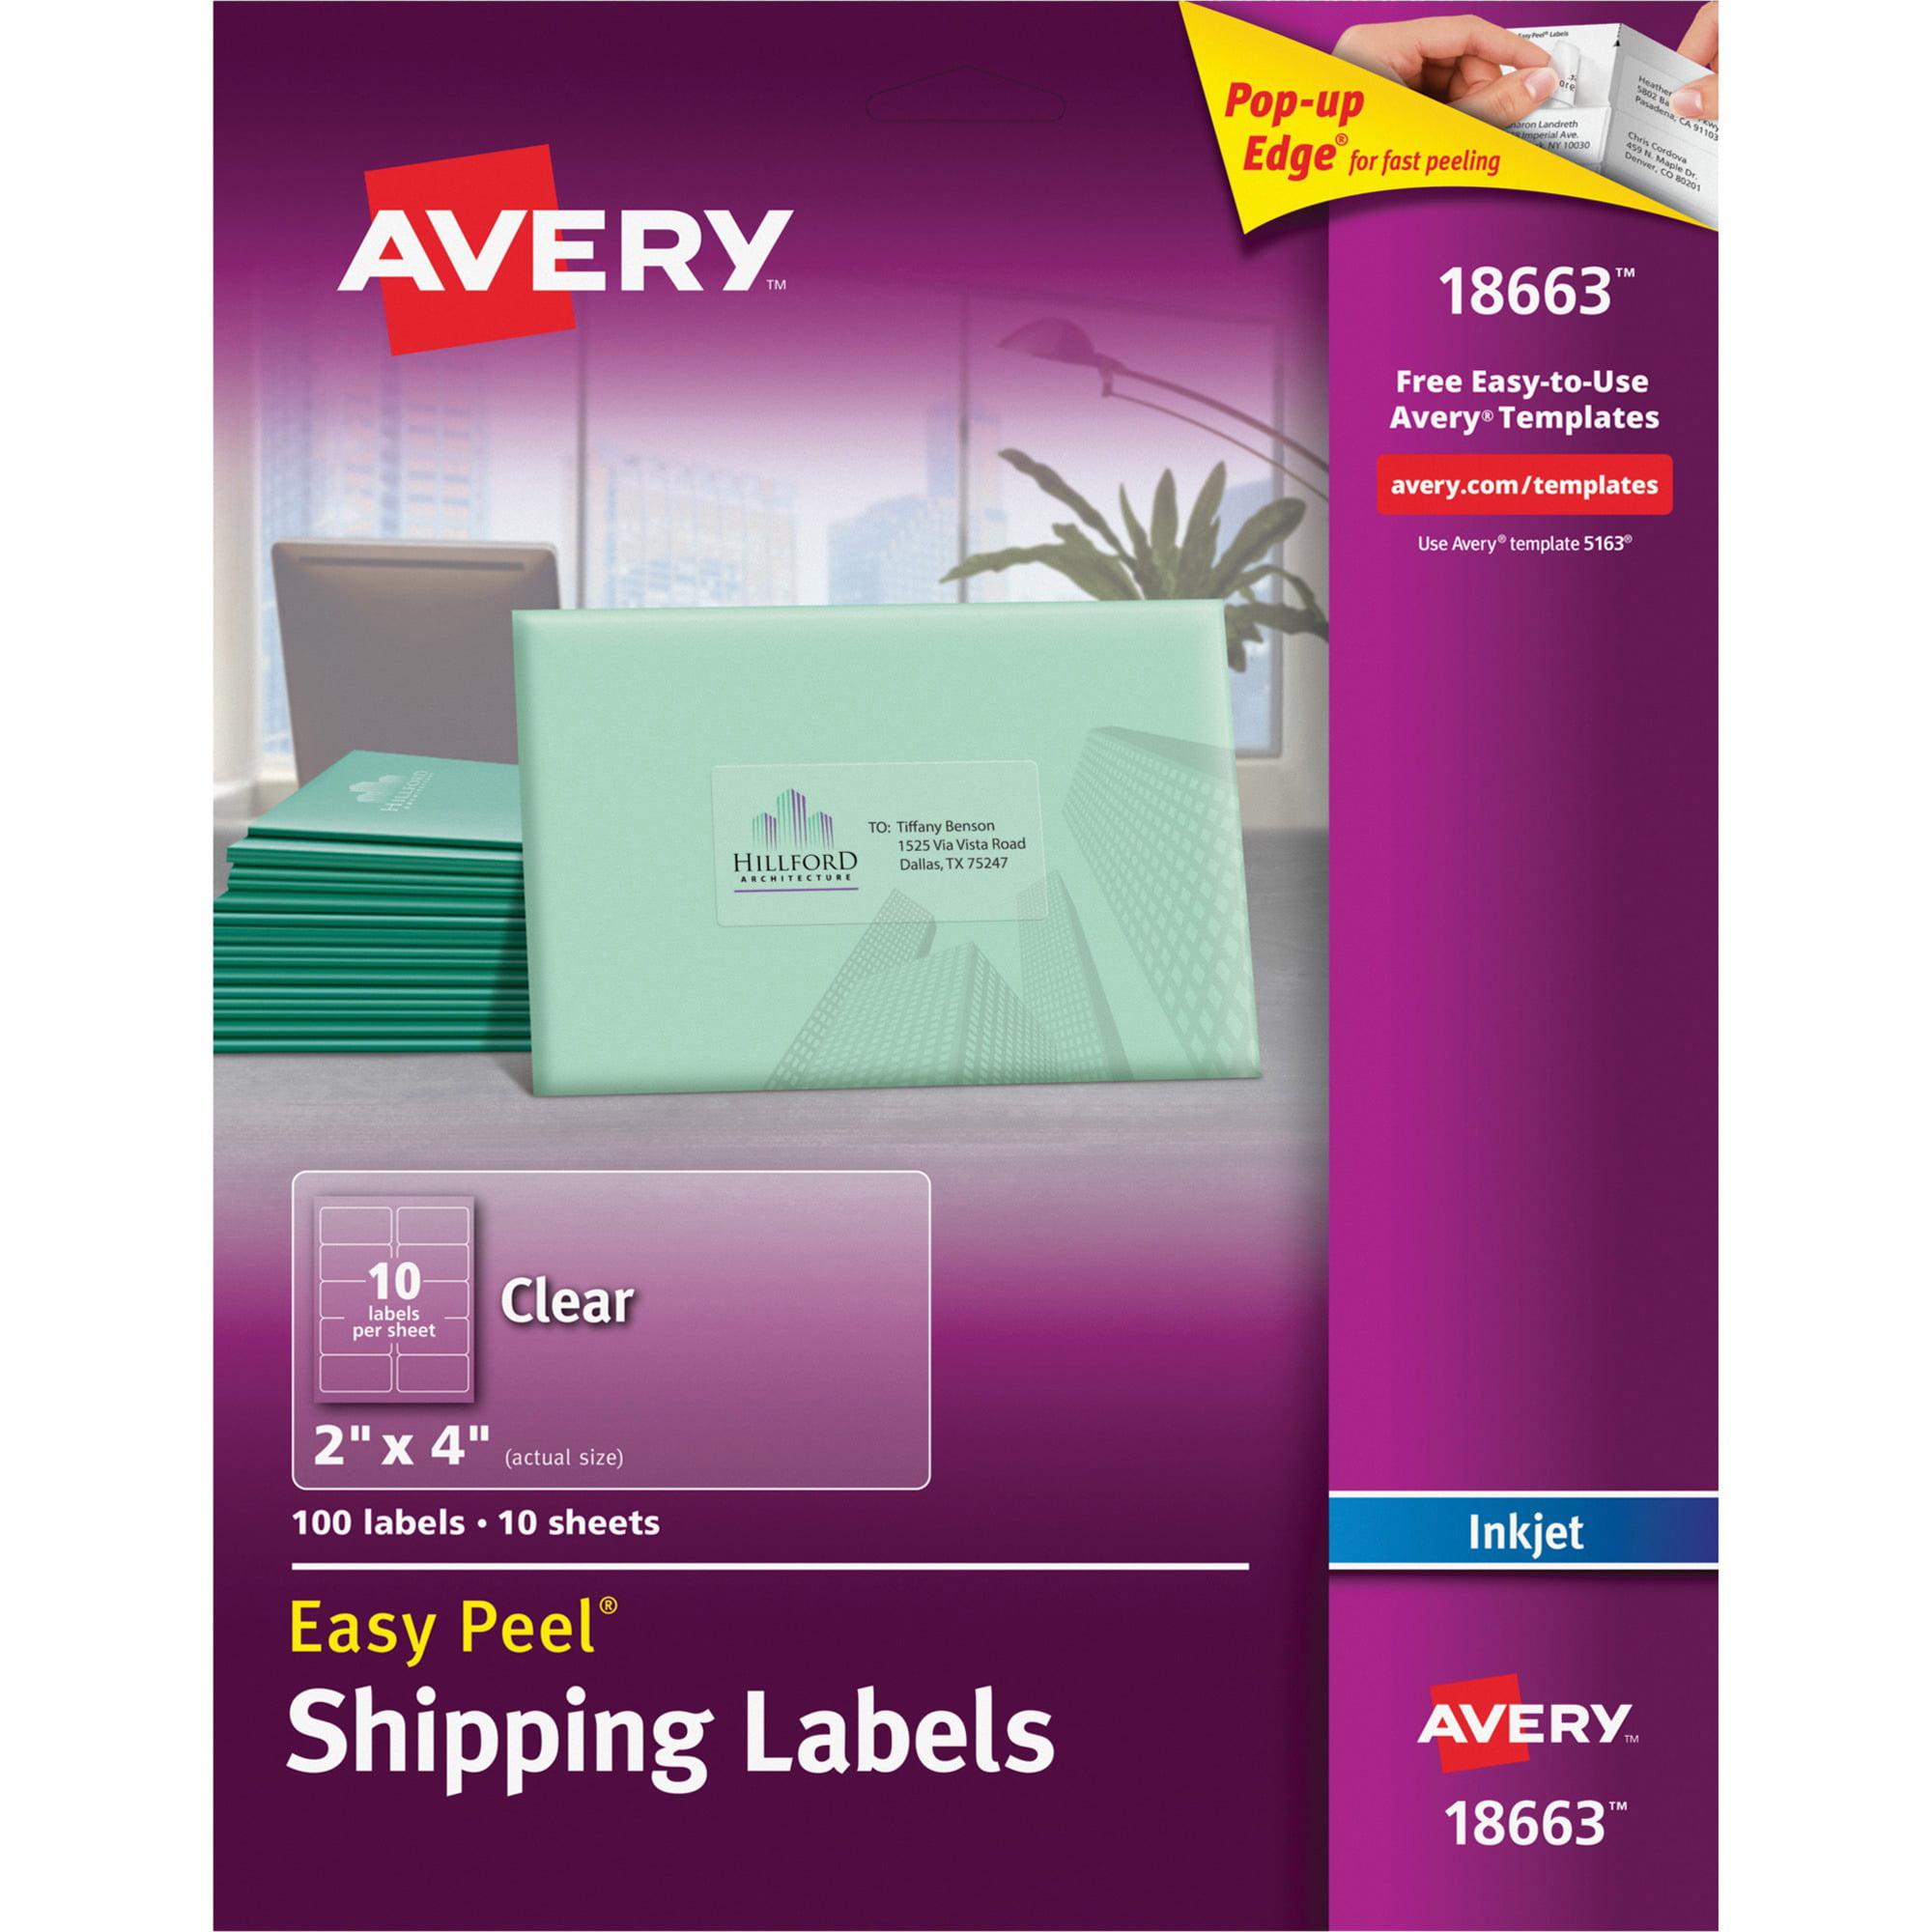 Avery Matte Clear Easy Peel Shipping Labels, Inkjet, 2 x 4, 100/Pack